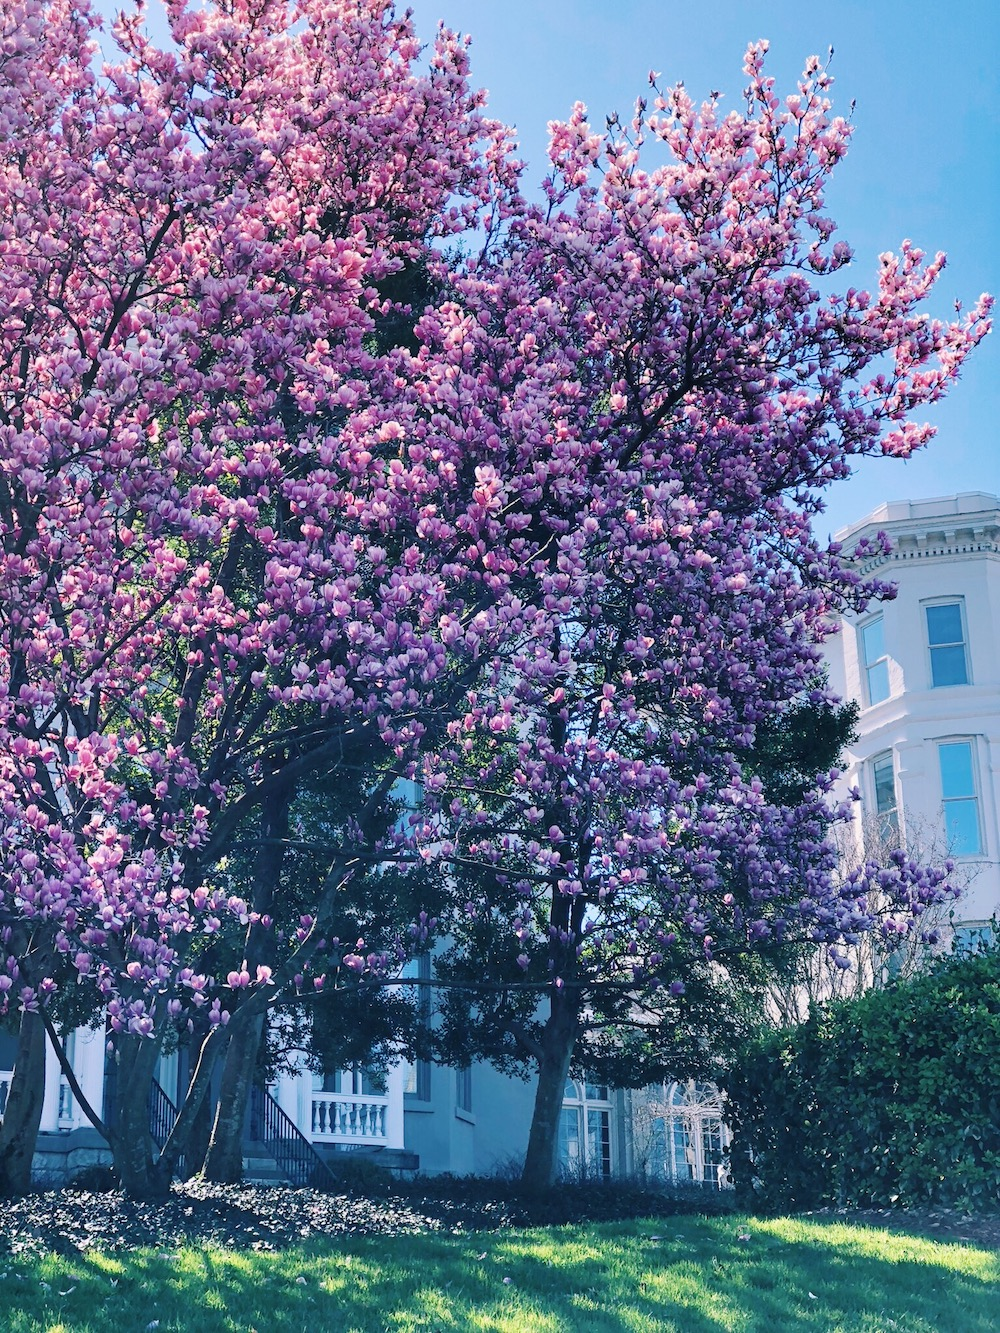 Belmont University Trees in bloom